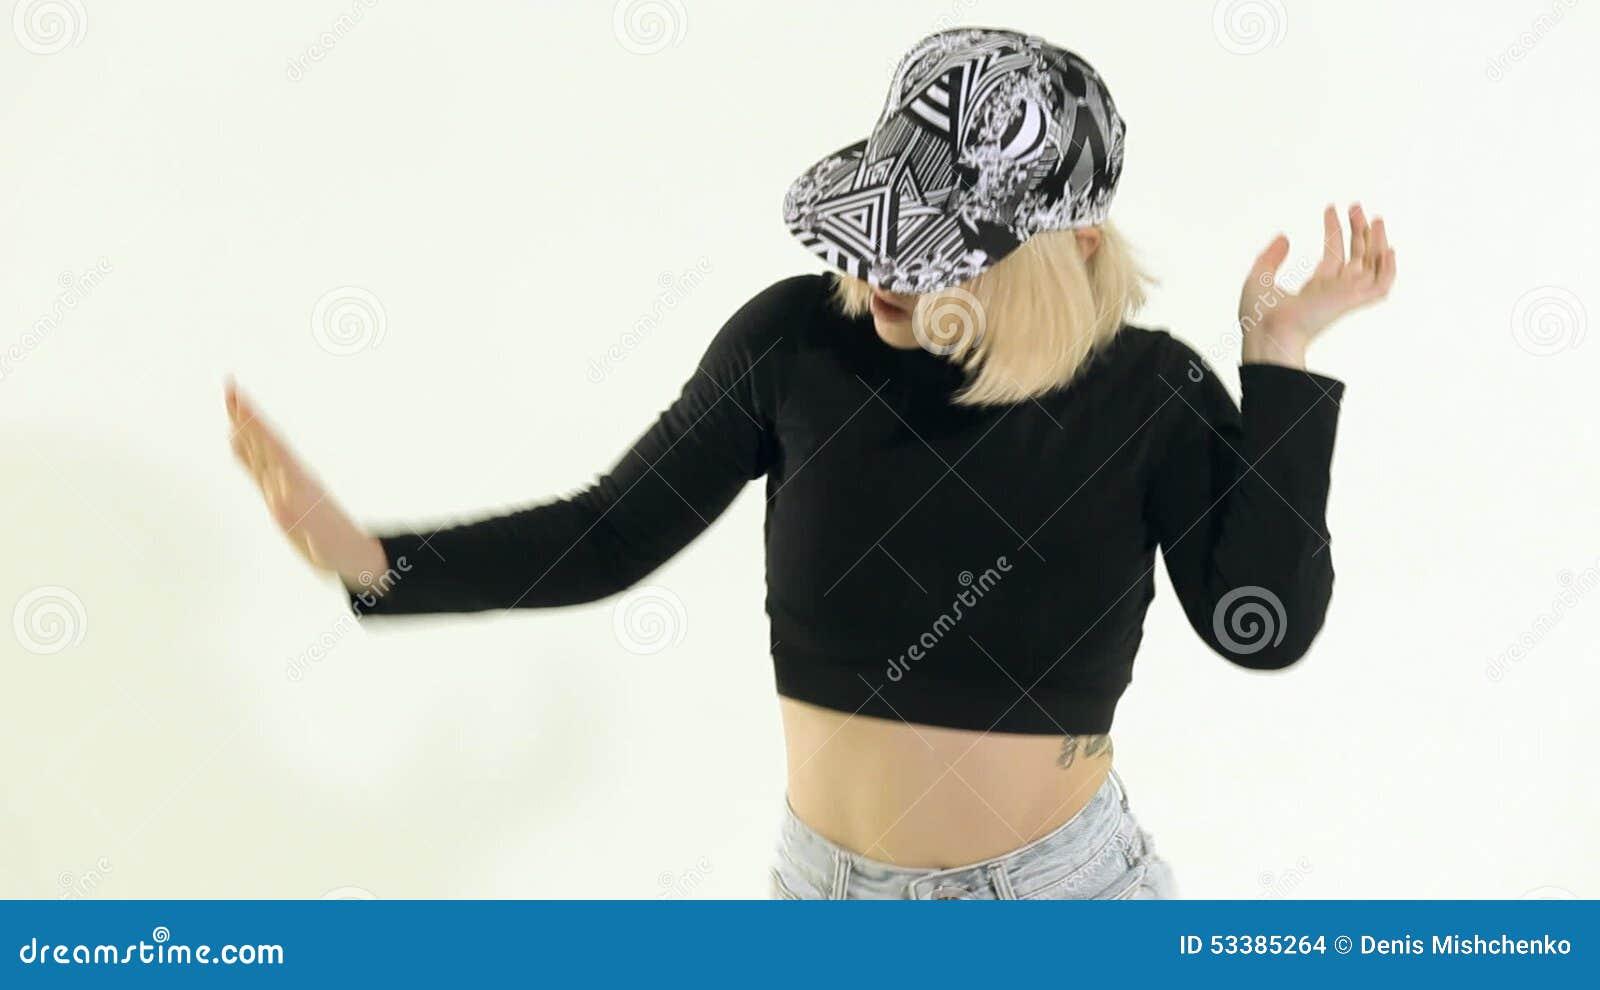 Gas mask booty shake